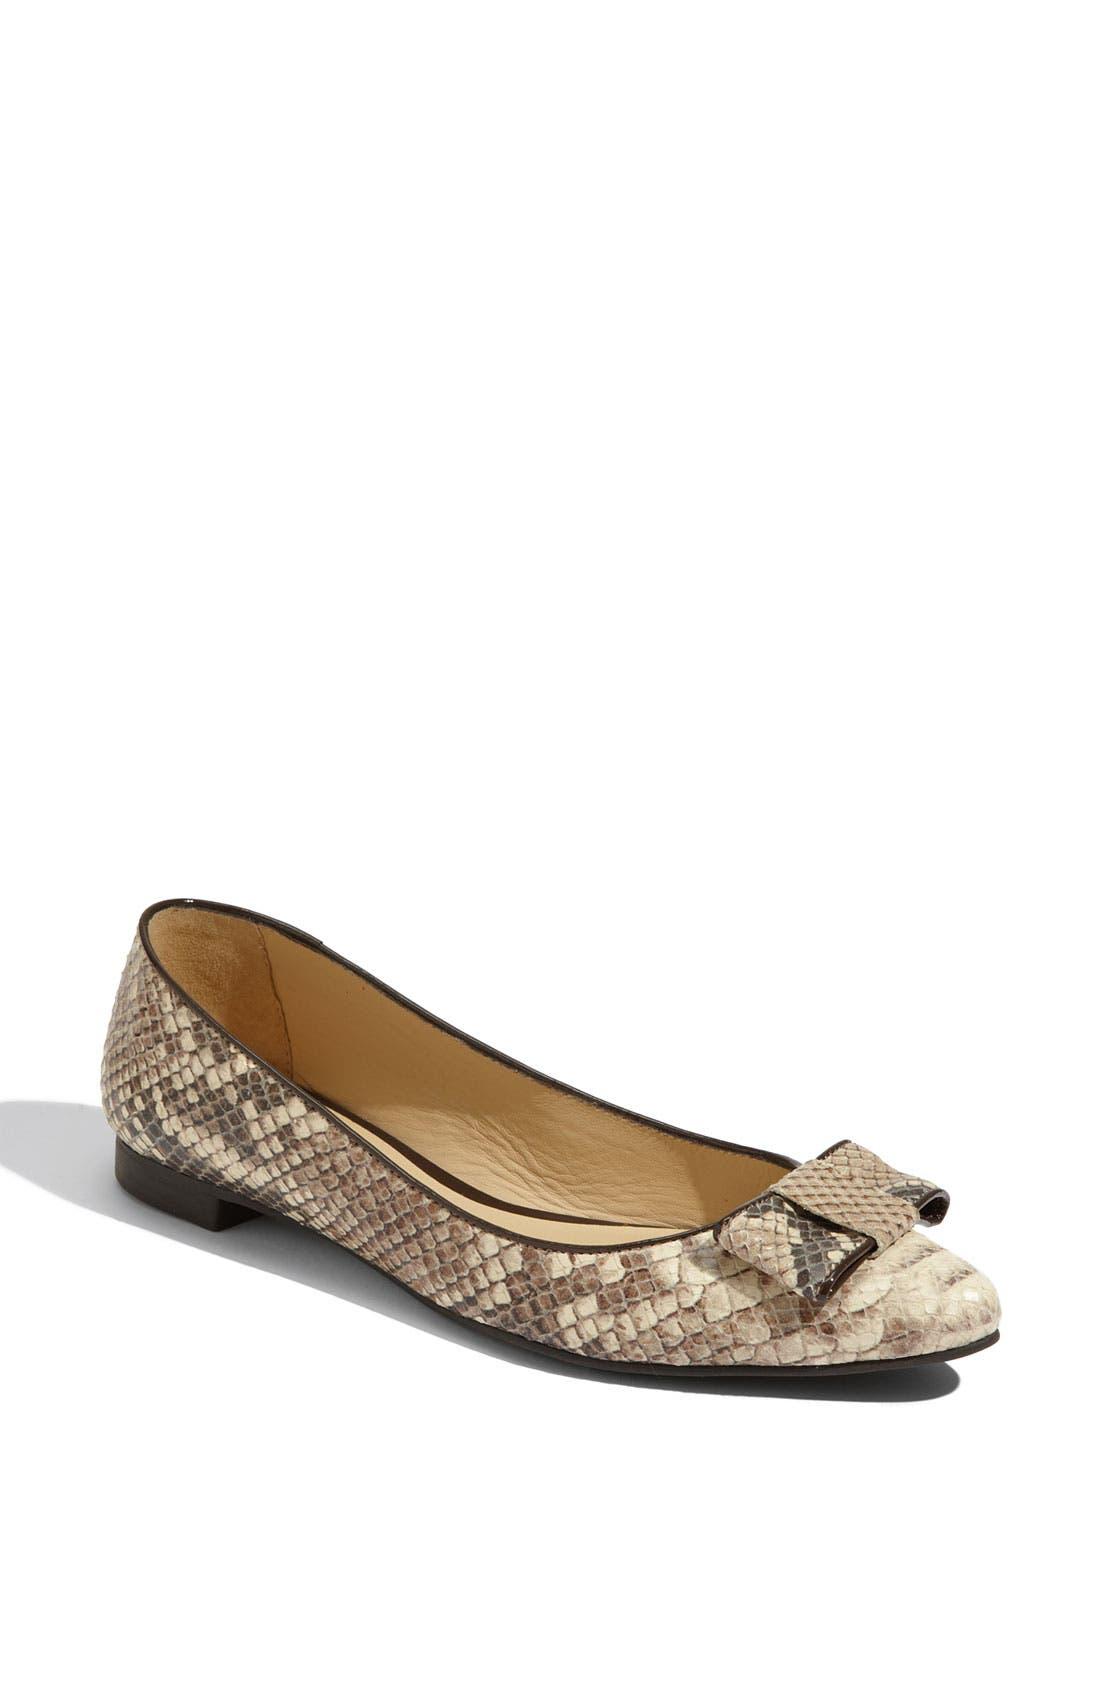 ,                             'elise' leopard print calf hair flat,                             Main thumbnail 5, color,                             250